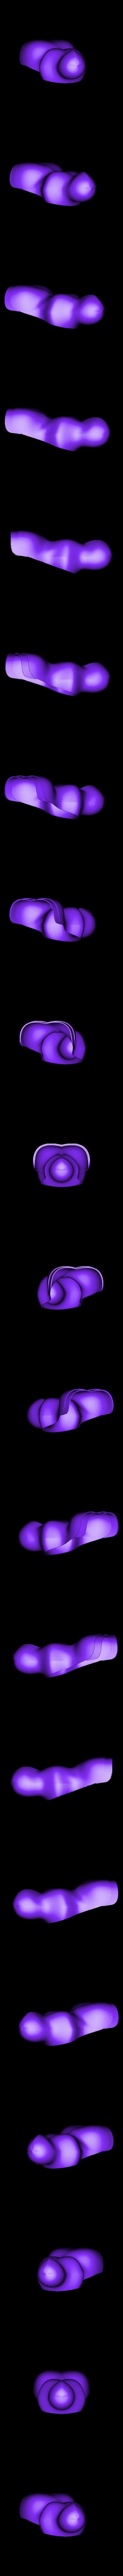 matriochka v3 a M.stl Télécharger fichier STL gratuit WHITE MATRIOCHKA • Design pour impression 3D, DJER